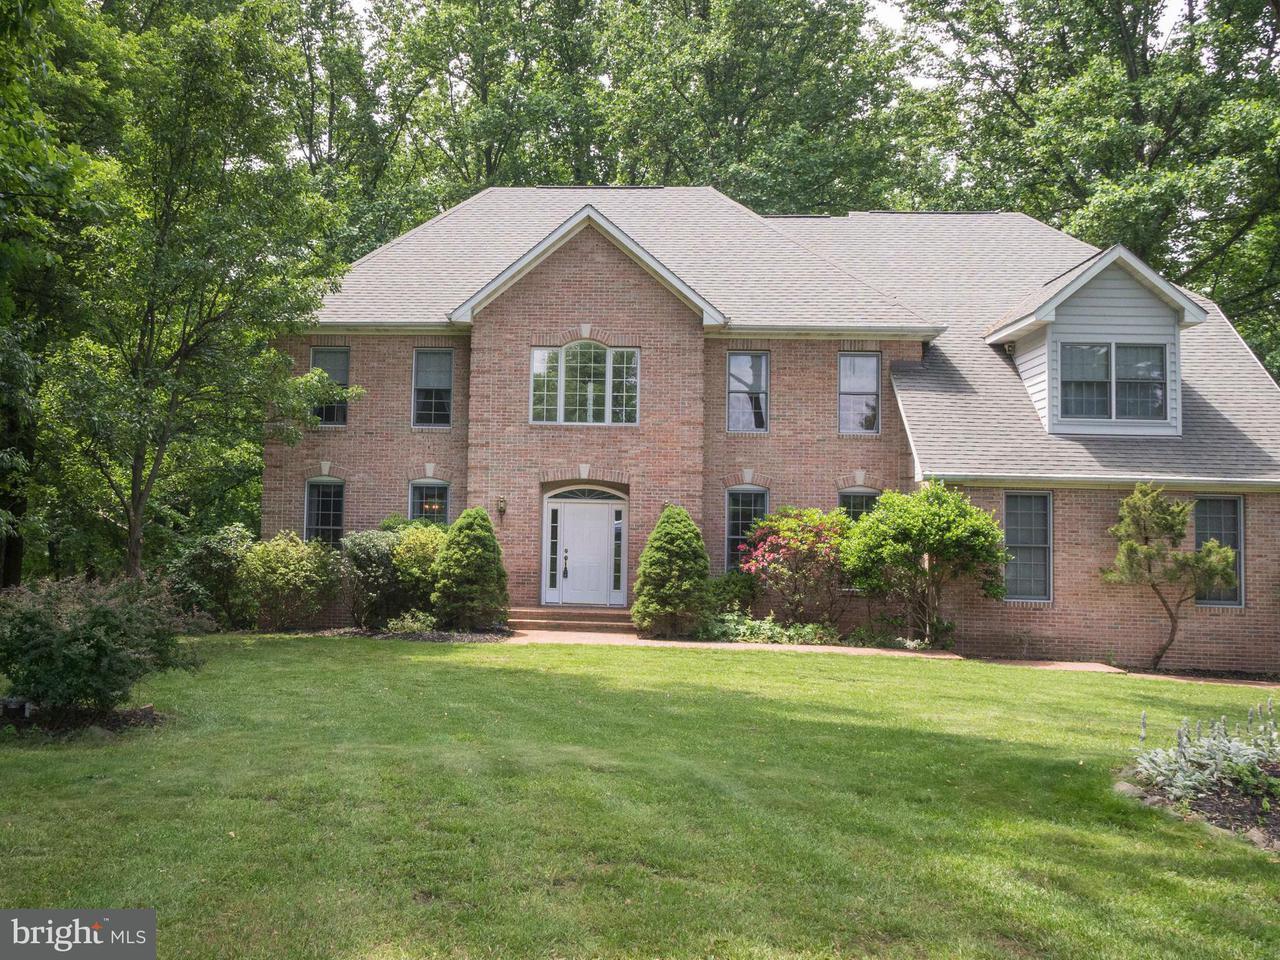 獨棟家庭住宅 為 出售 在 11501 HOLT Road 11501 HOLT Road Kingsville, 馬里蘭州 21087 美國